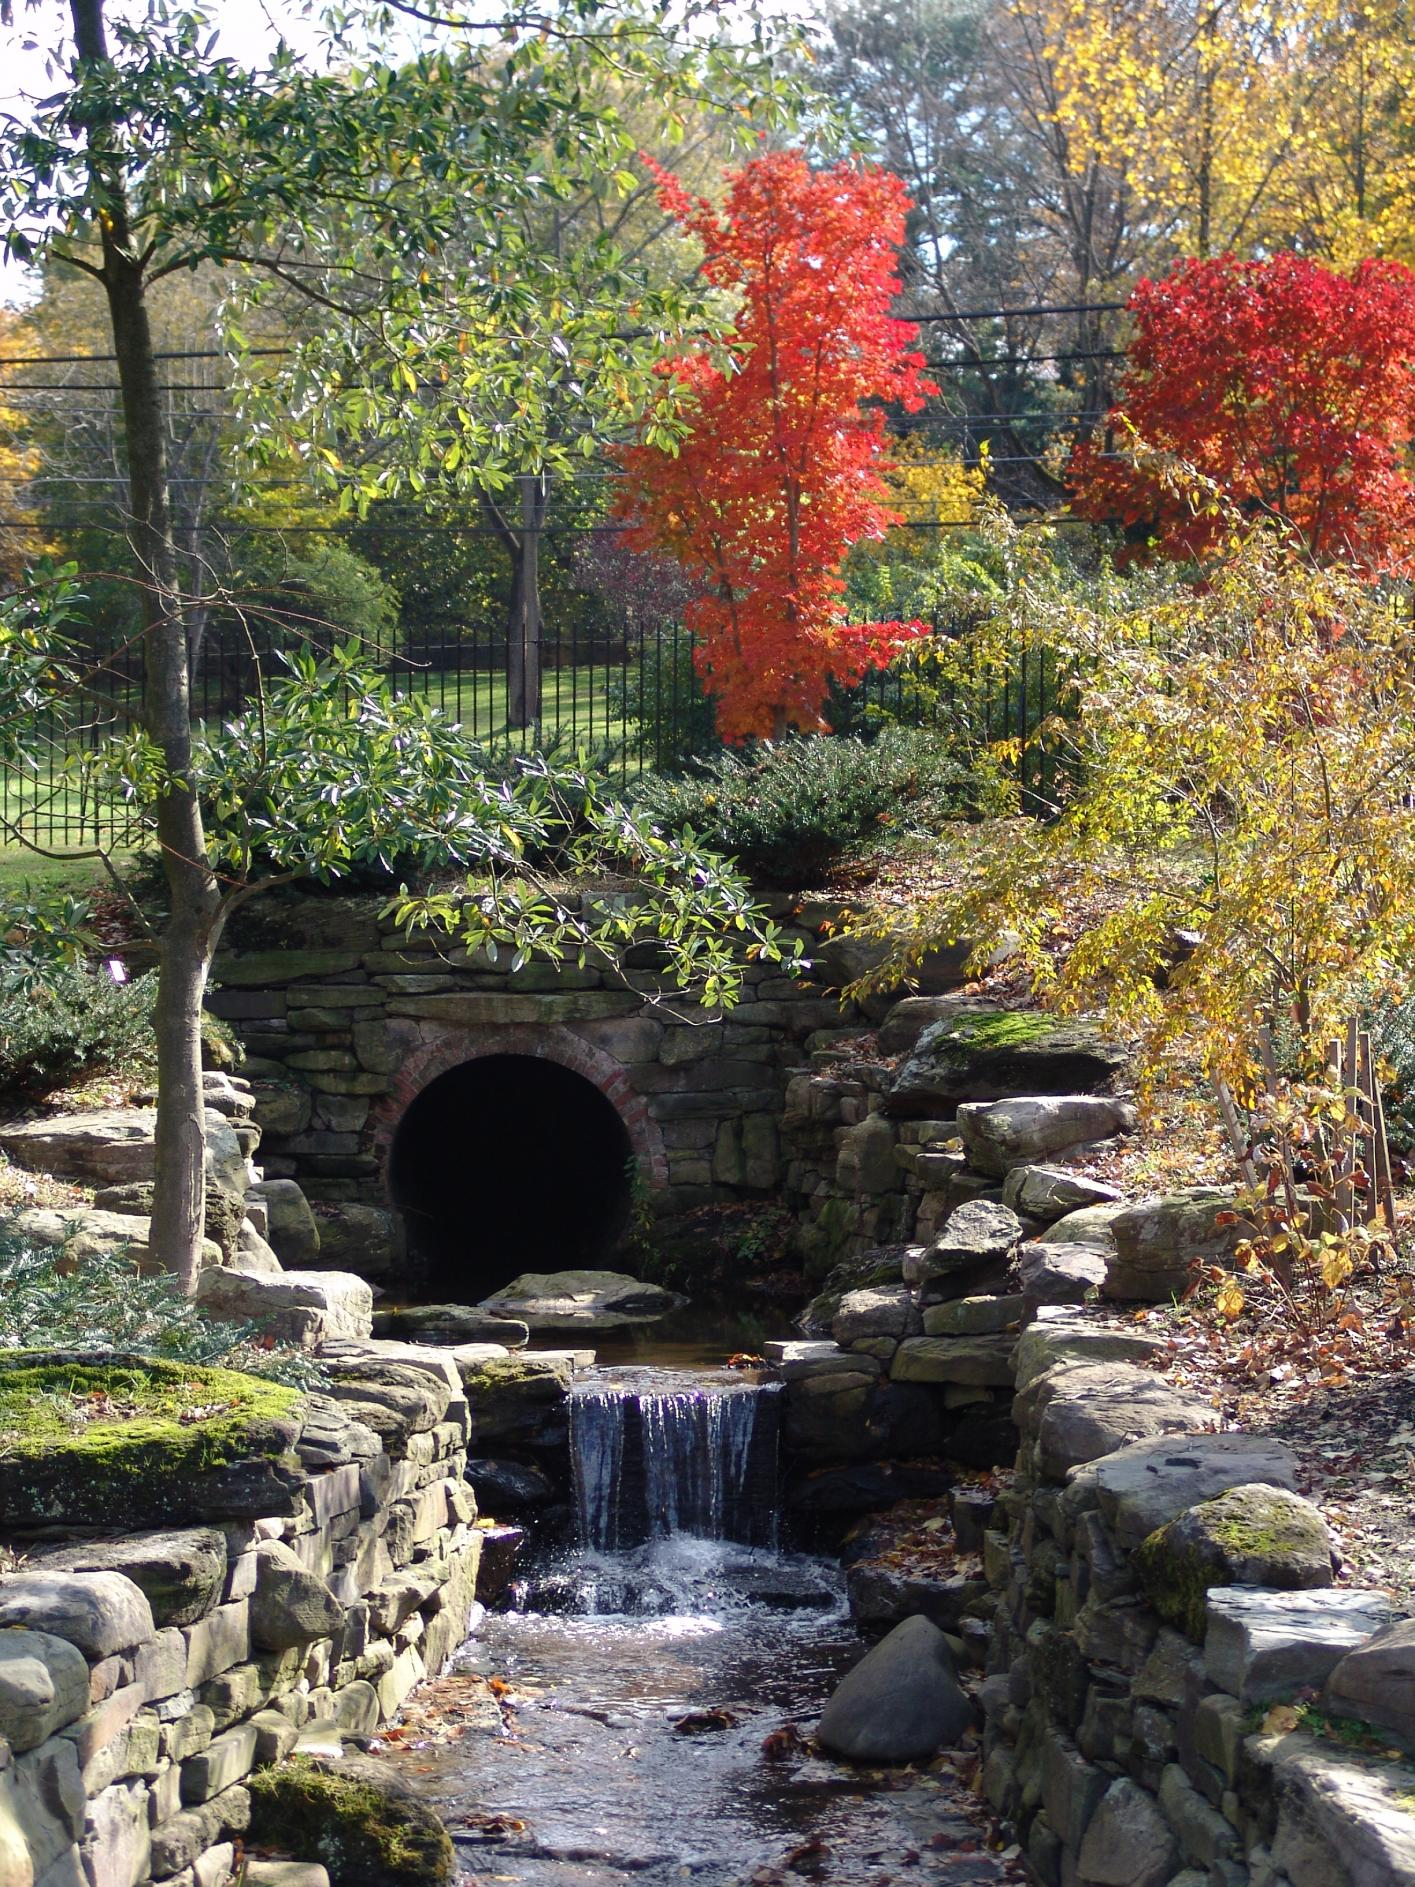 Acer Multisite American Public Gardens Association